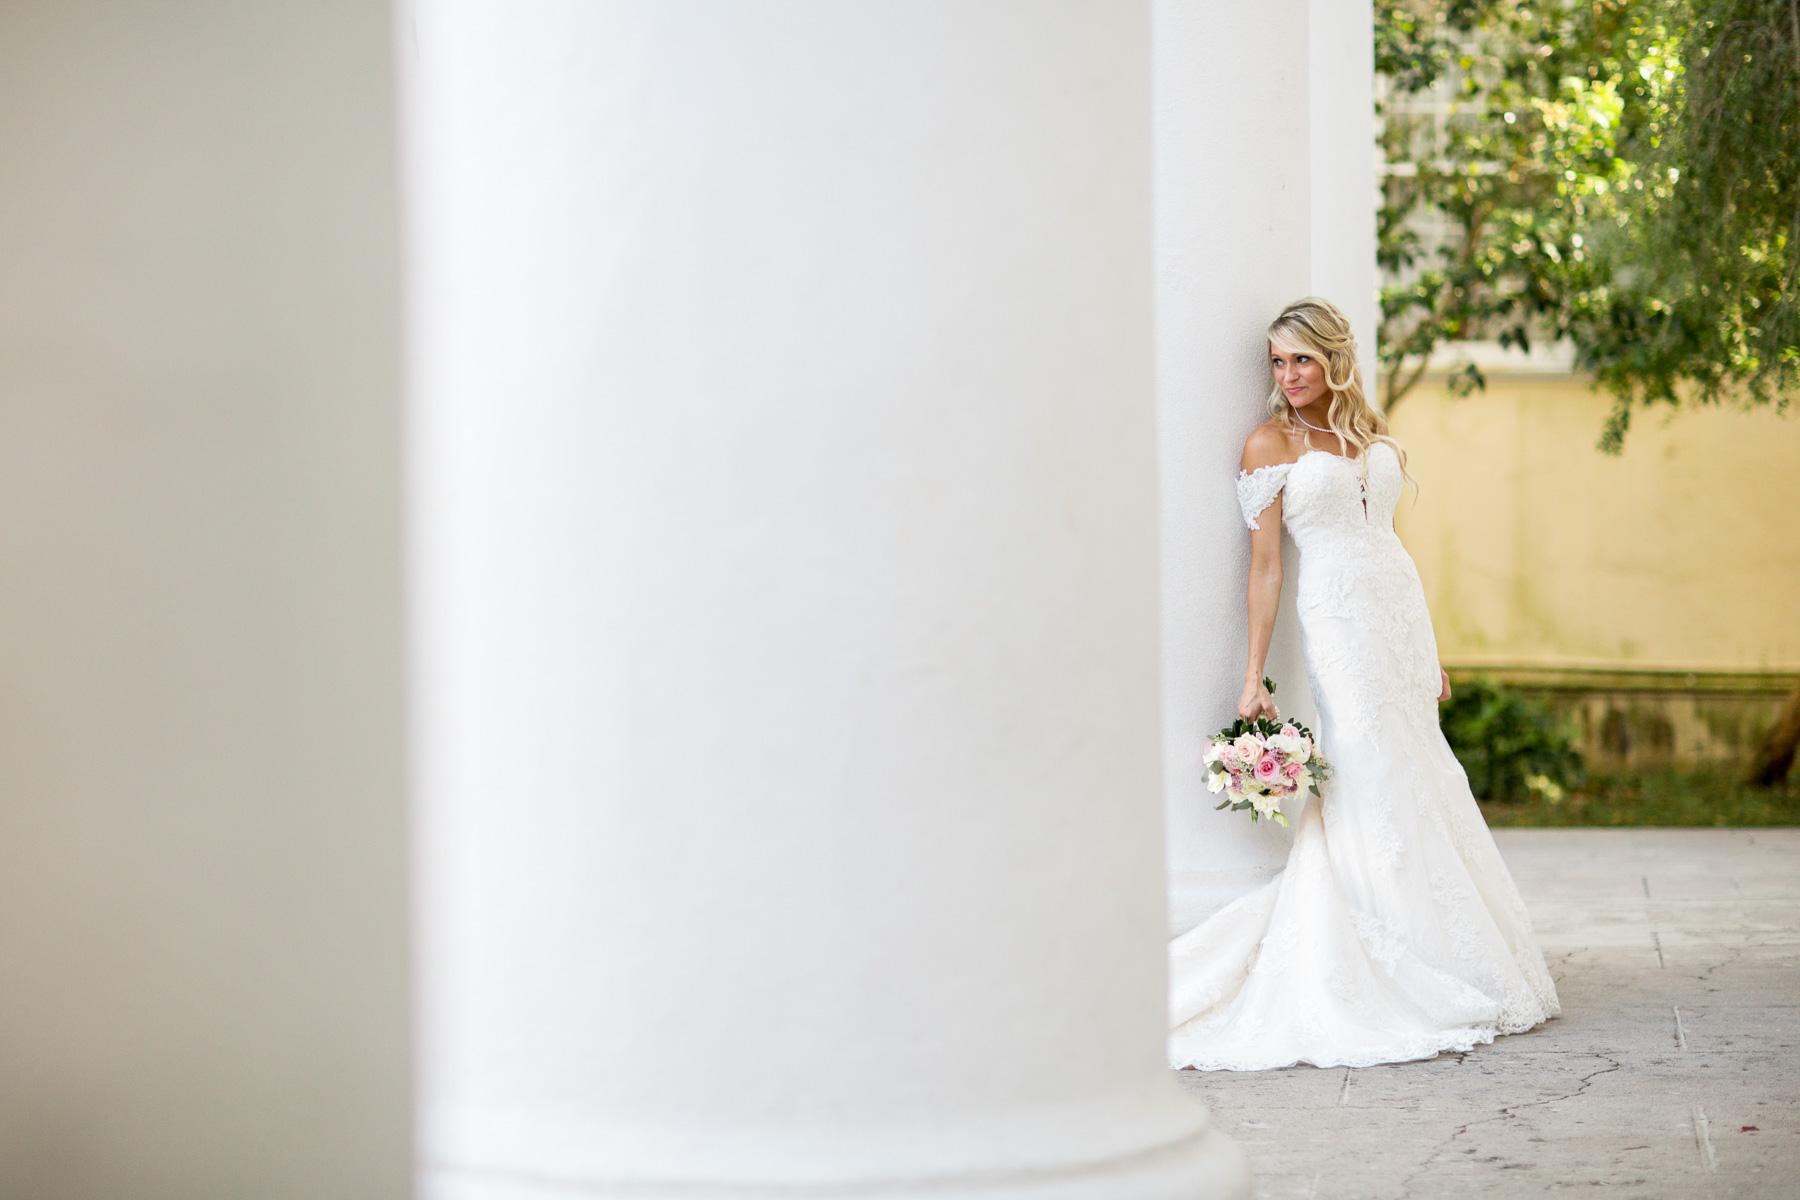 Charleston-best-wedding-photographer-SC-21.jpg